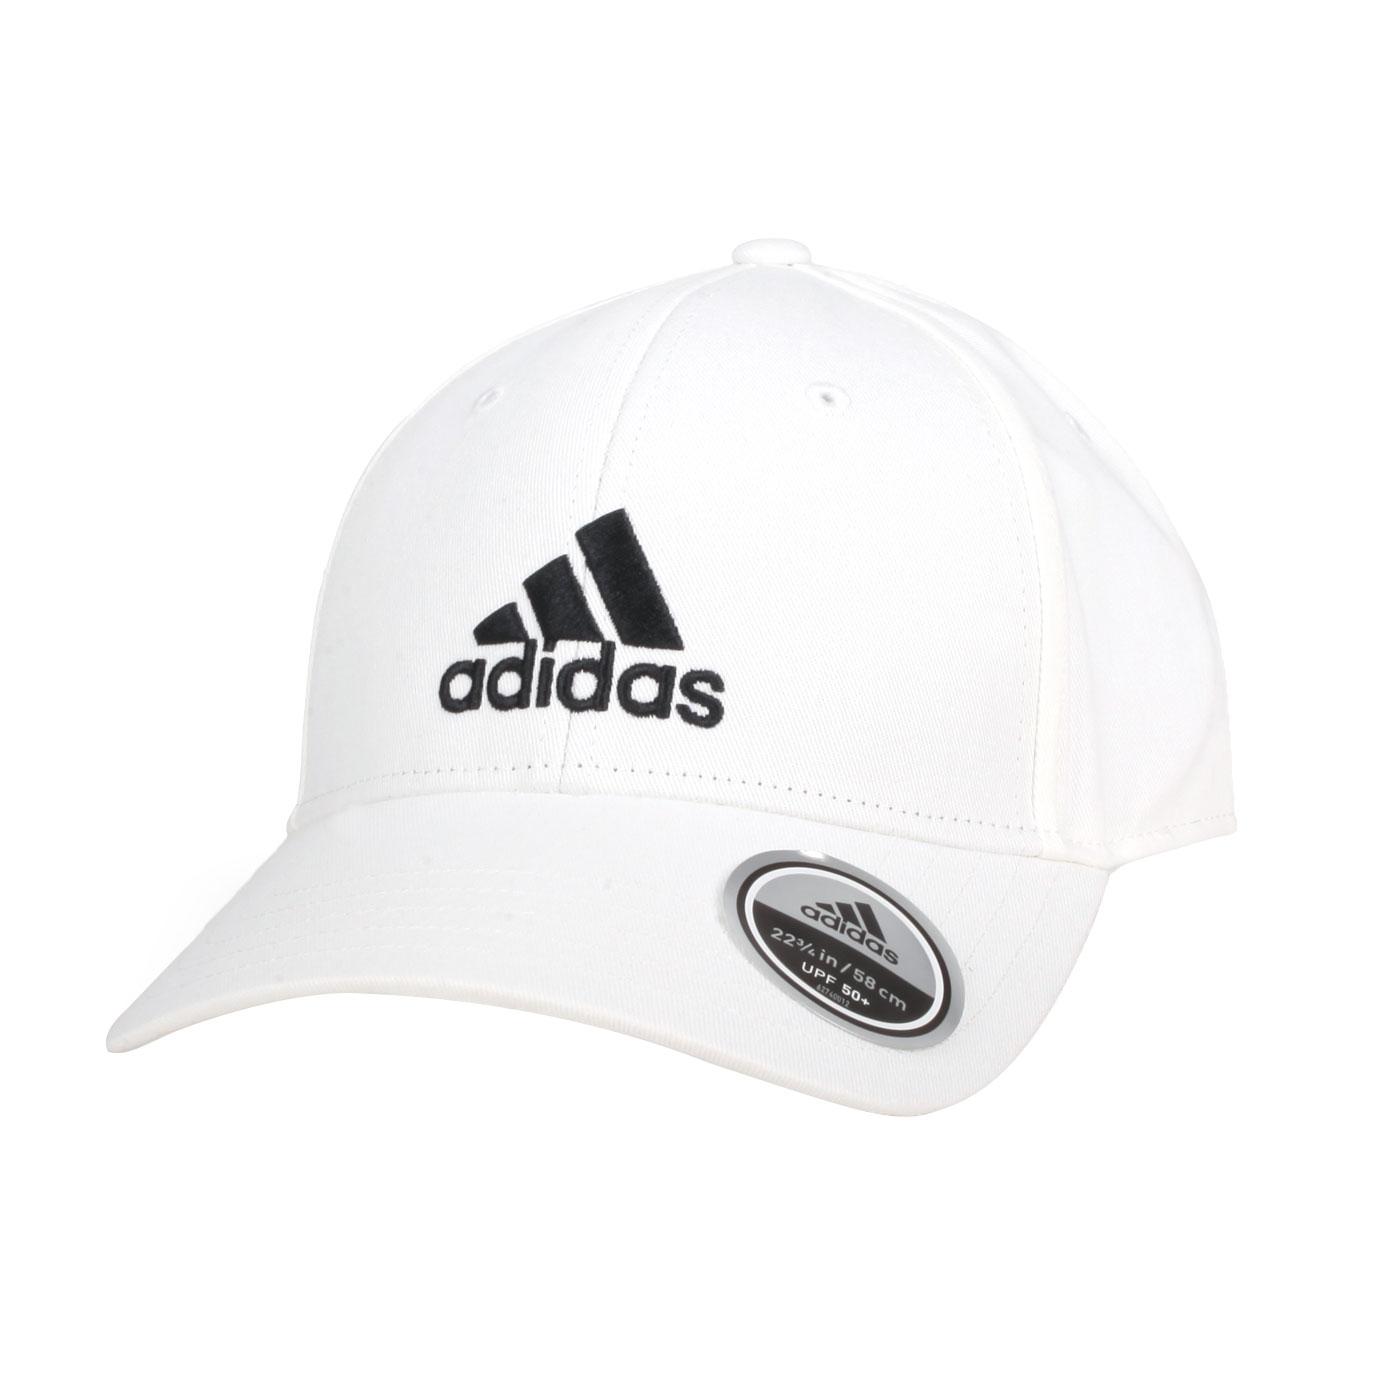 ADIDAS 運動帽 FK0890 - 白黑